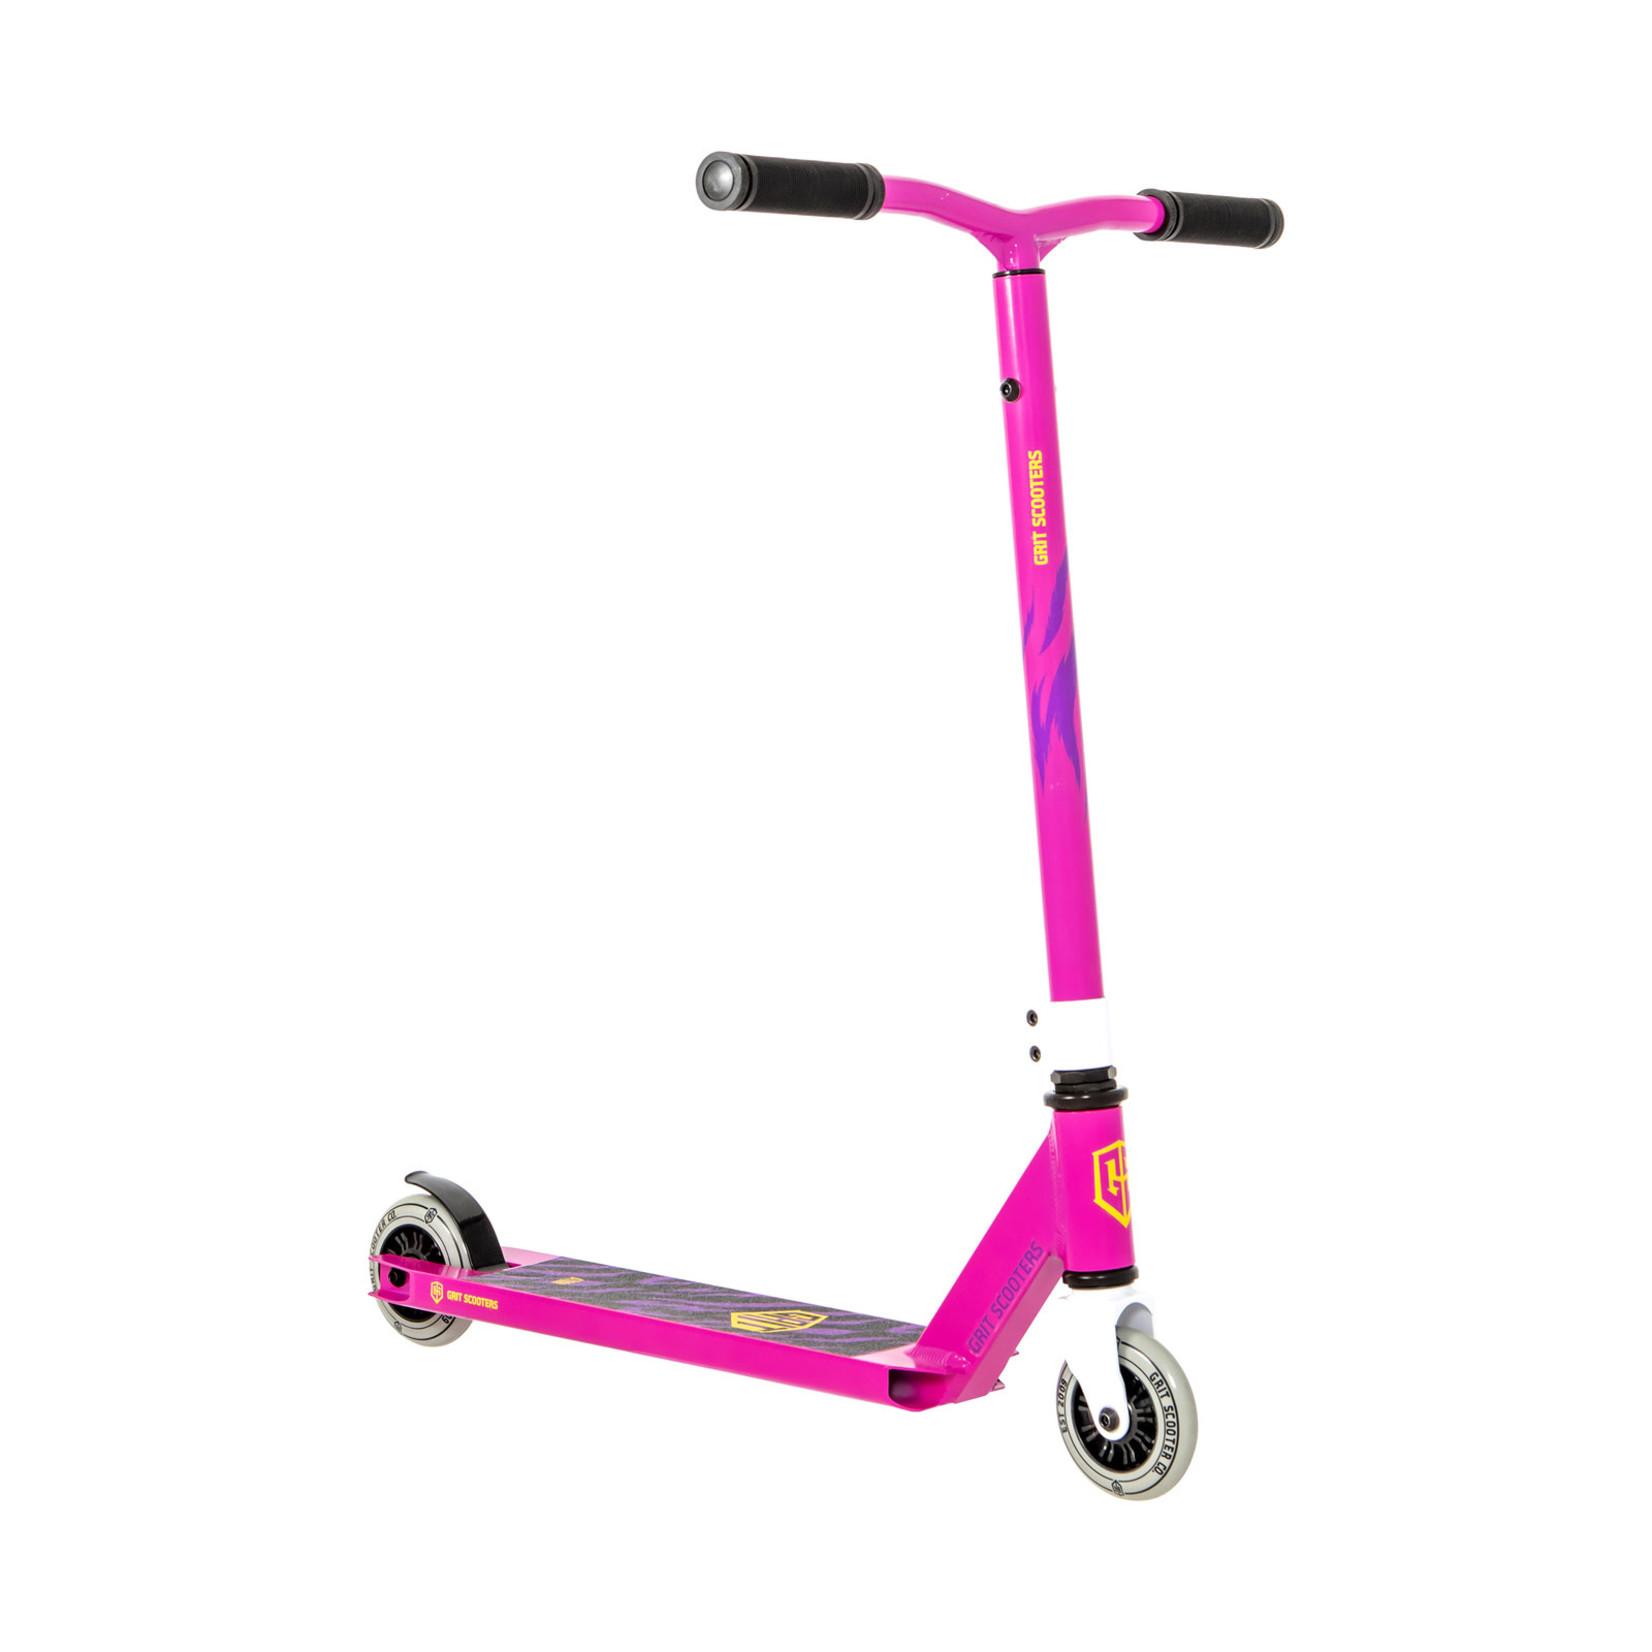 GRIT Grit Atom Height Adjustable Bars 2021 Pink Scooter